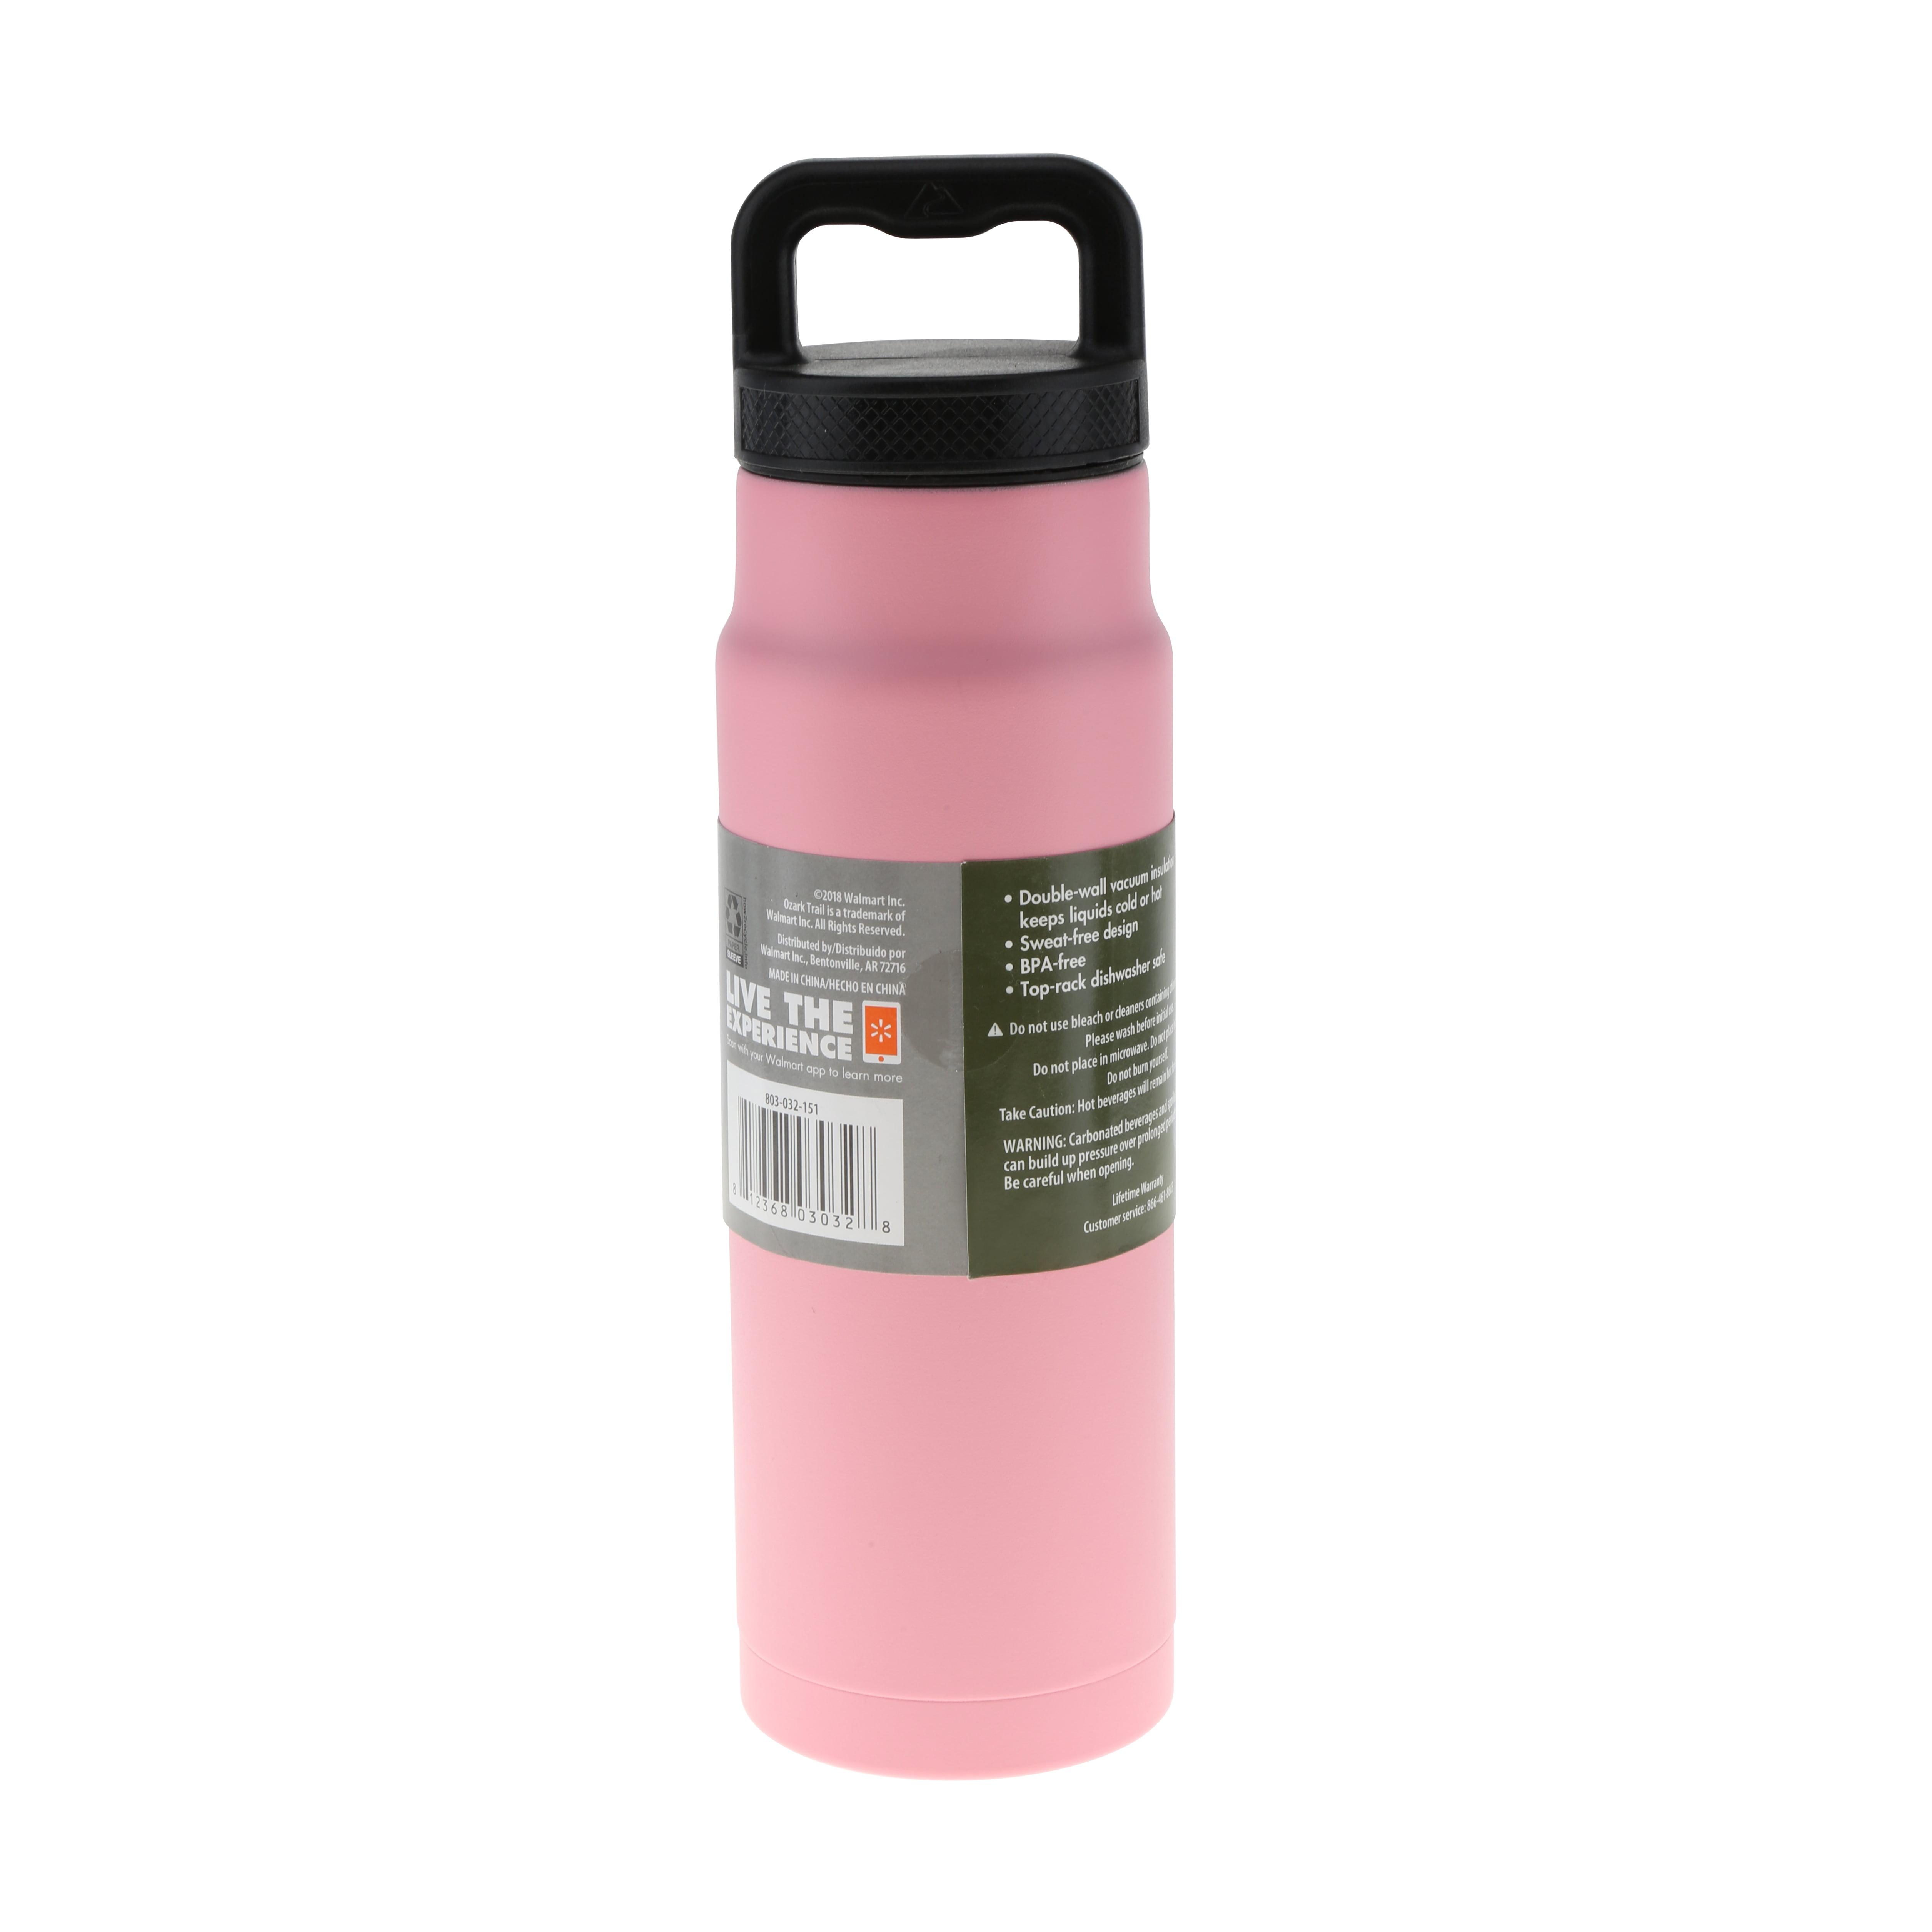 Bucknell University-24oz Stainless Steel Grip Water Bottle with Straw-Orange